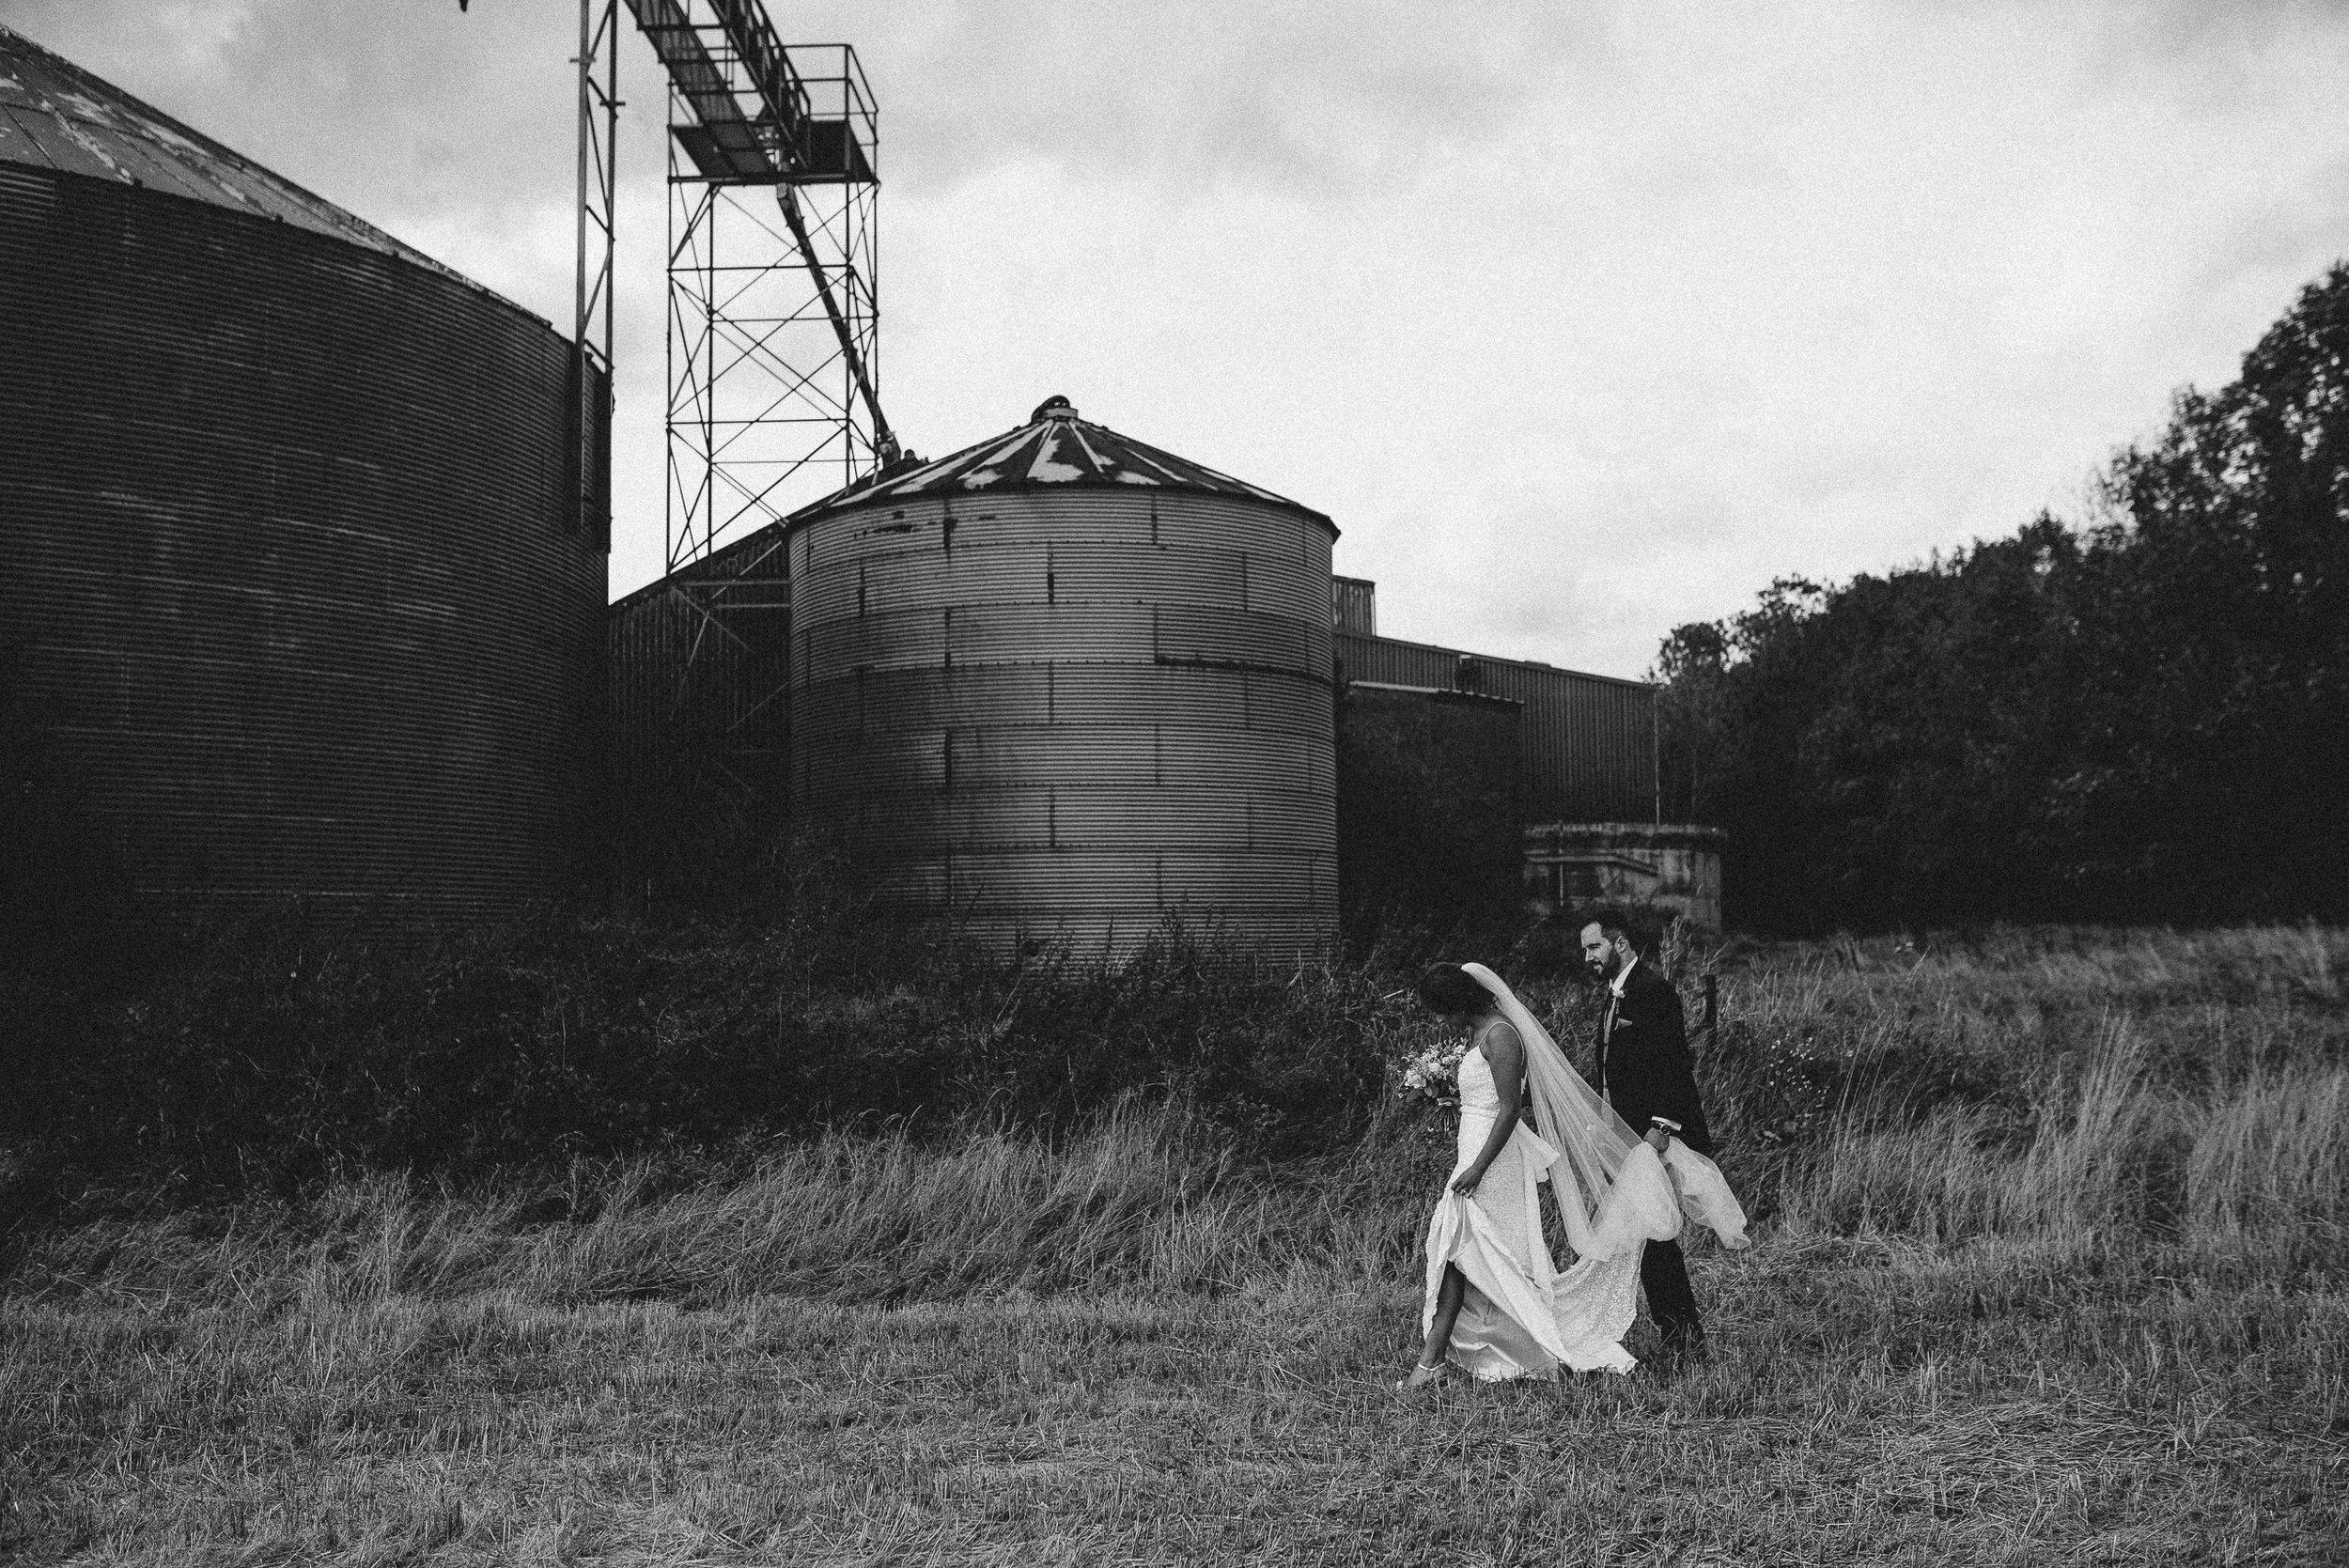 wedding-photography-workshop-epic-love-11.jpg